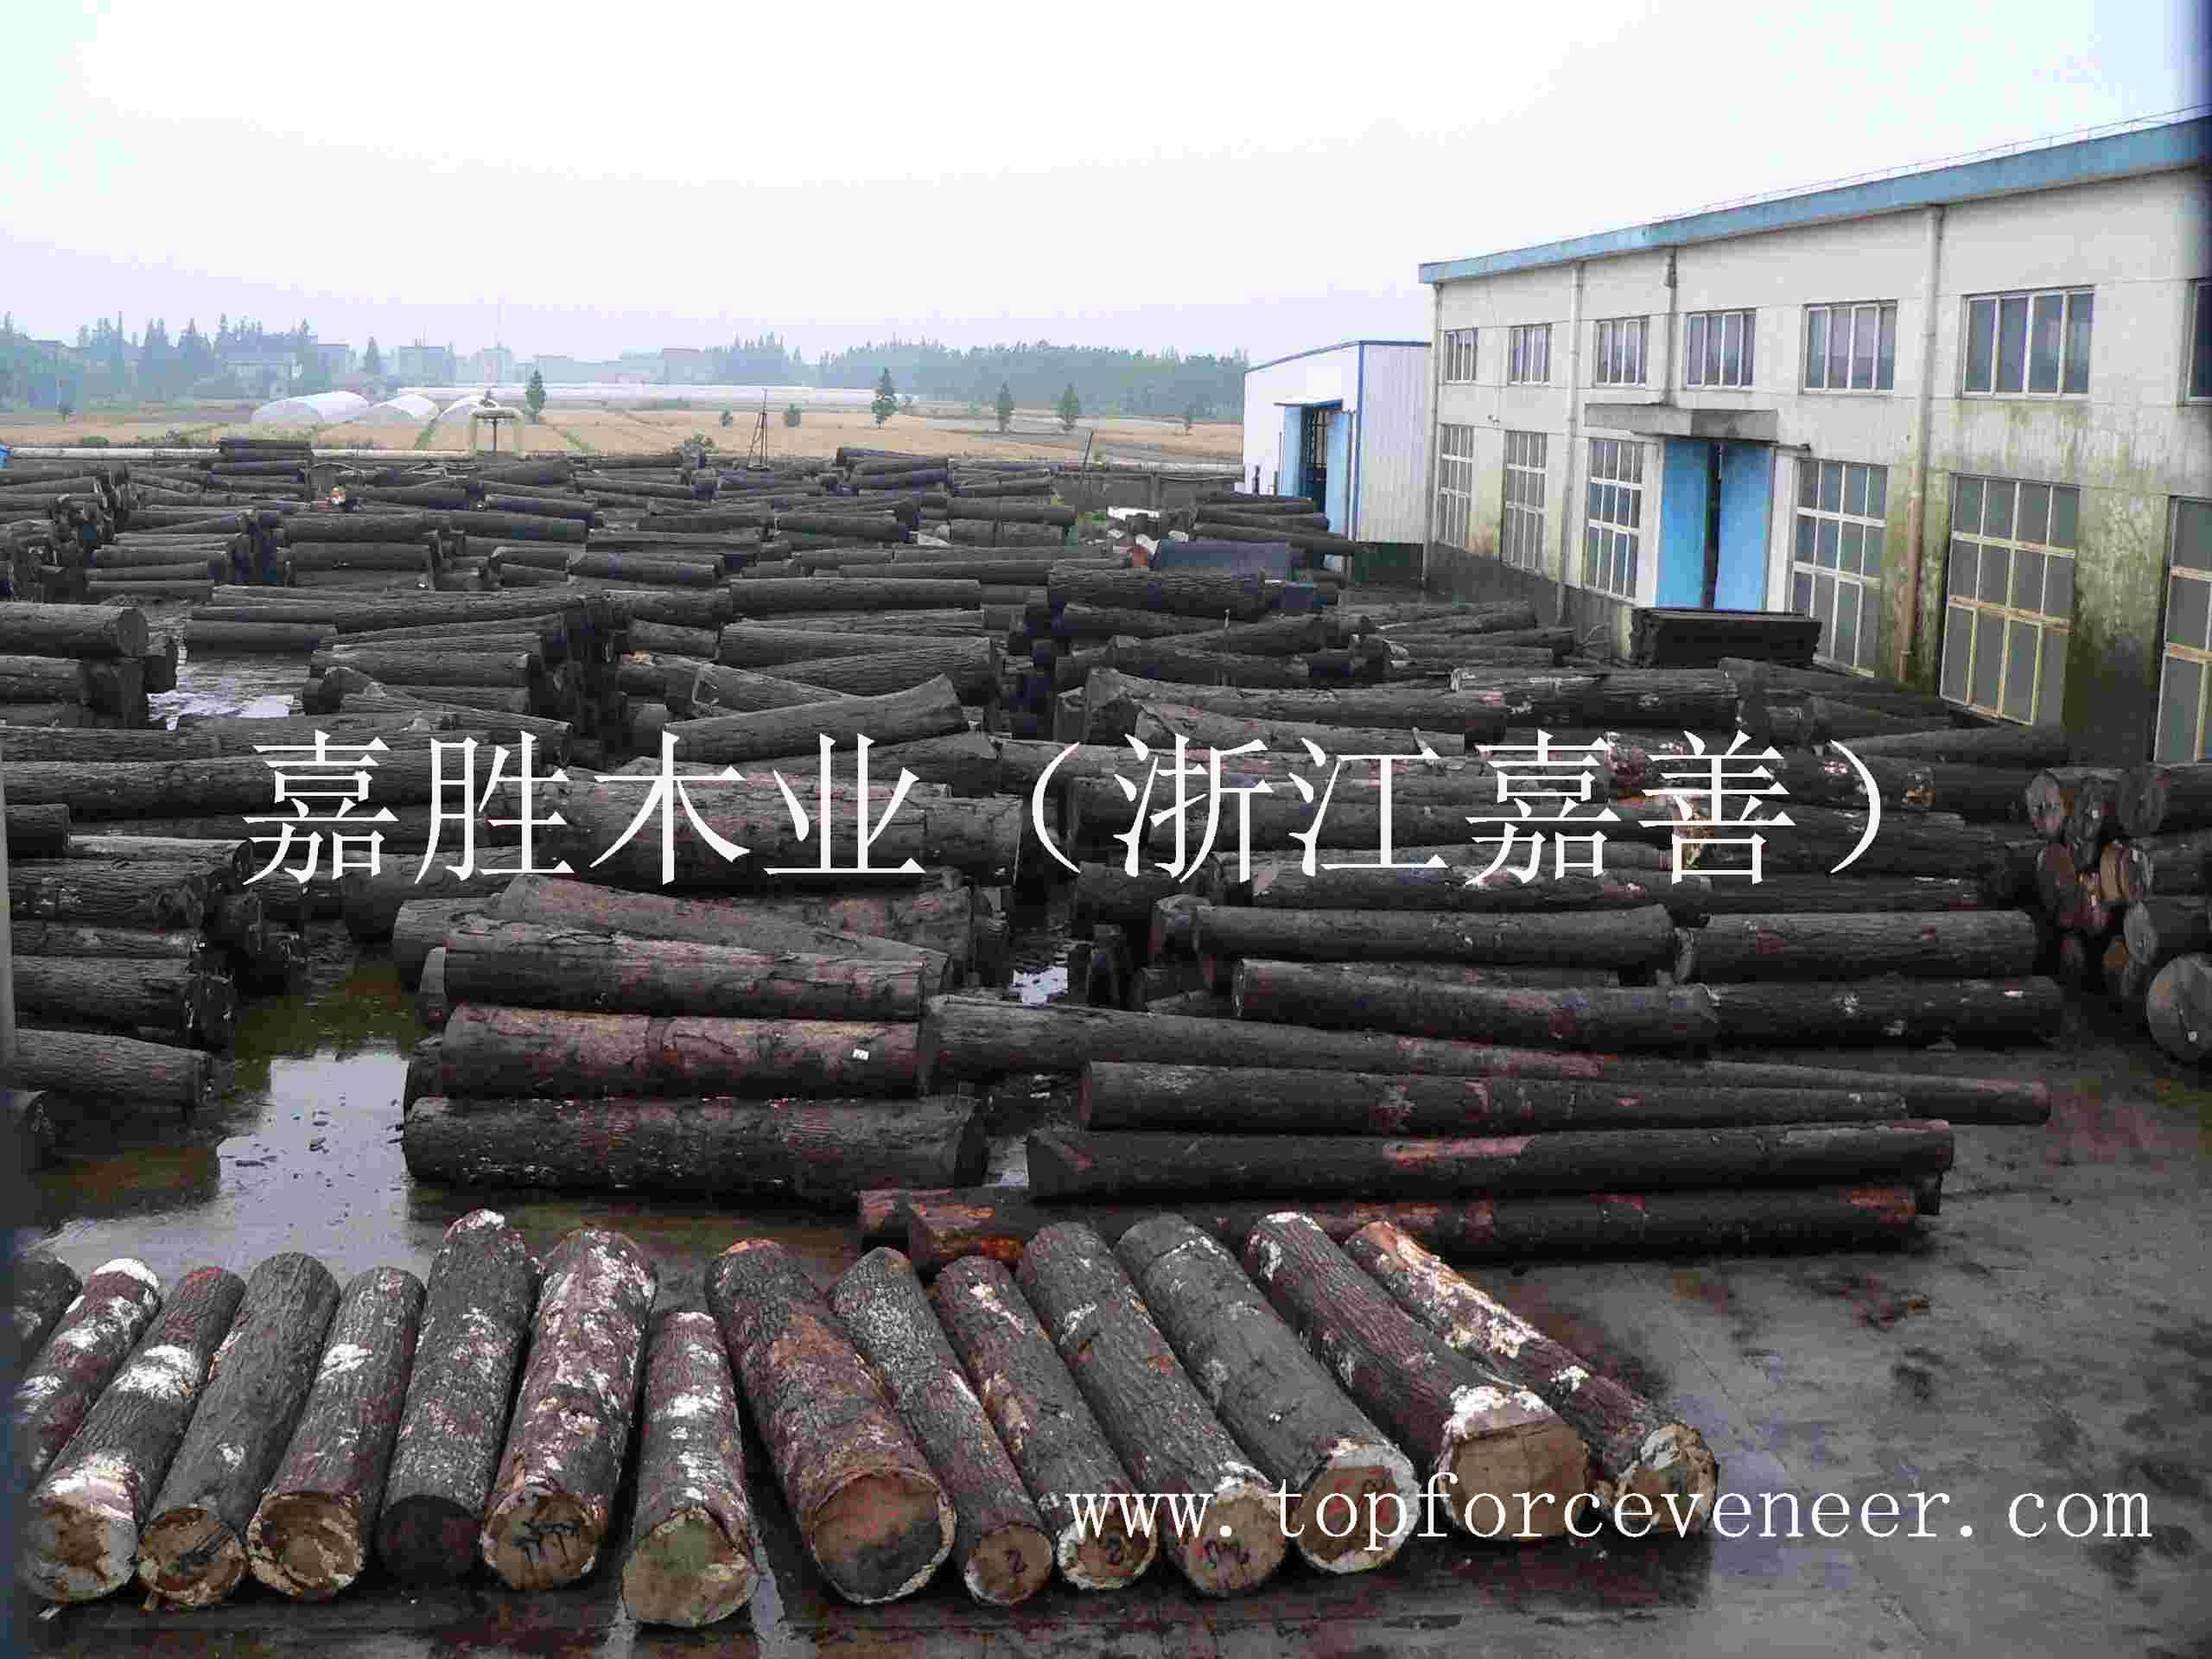 嘉兴专业黑胡桃原木 JiaXing JiaShan American Walnut Veneer Logs and Saw Logs specialist